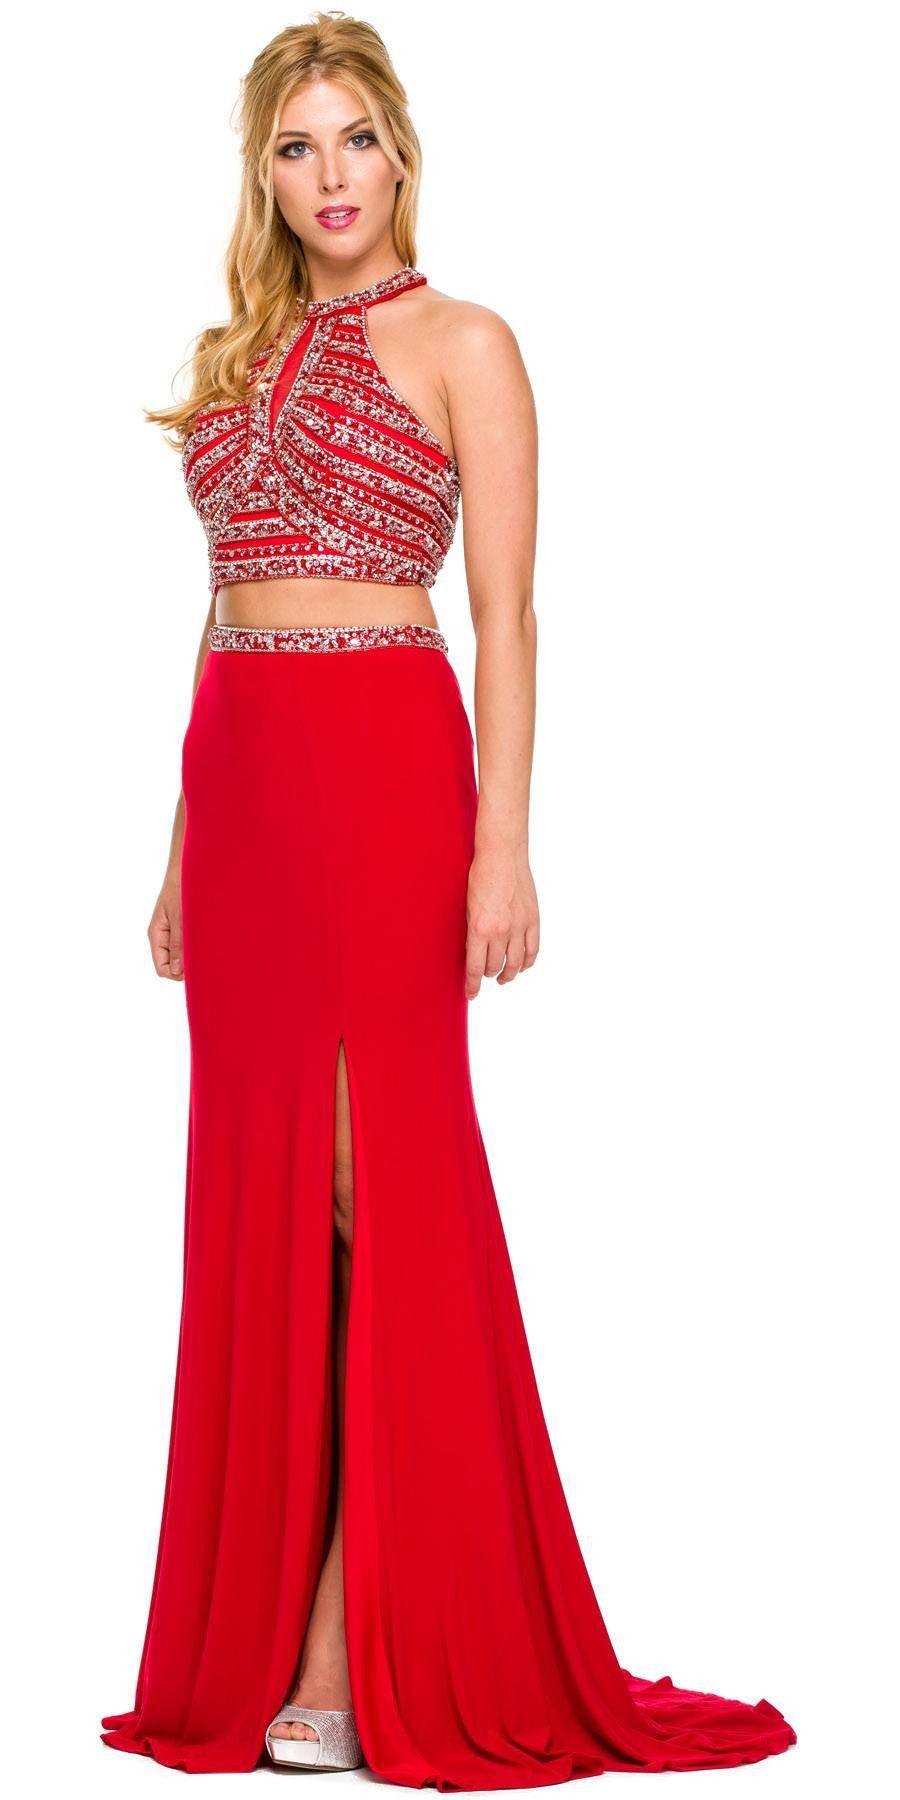 Formal piece red gown ity stretch rhinestones halter hoco